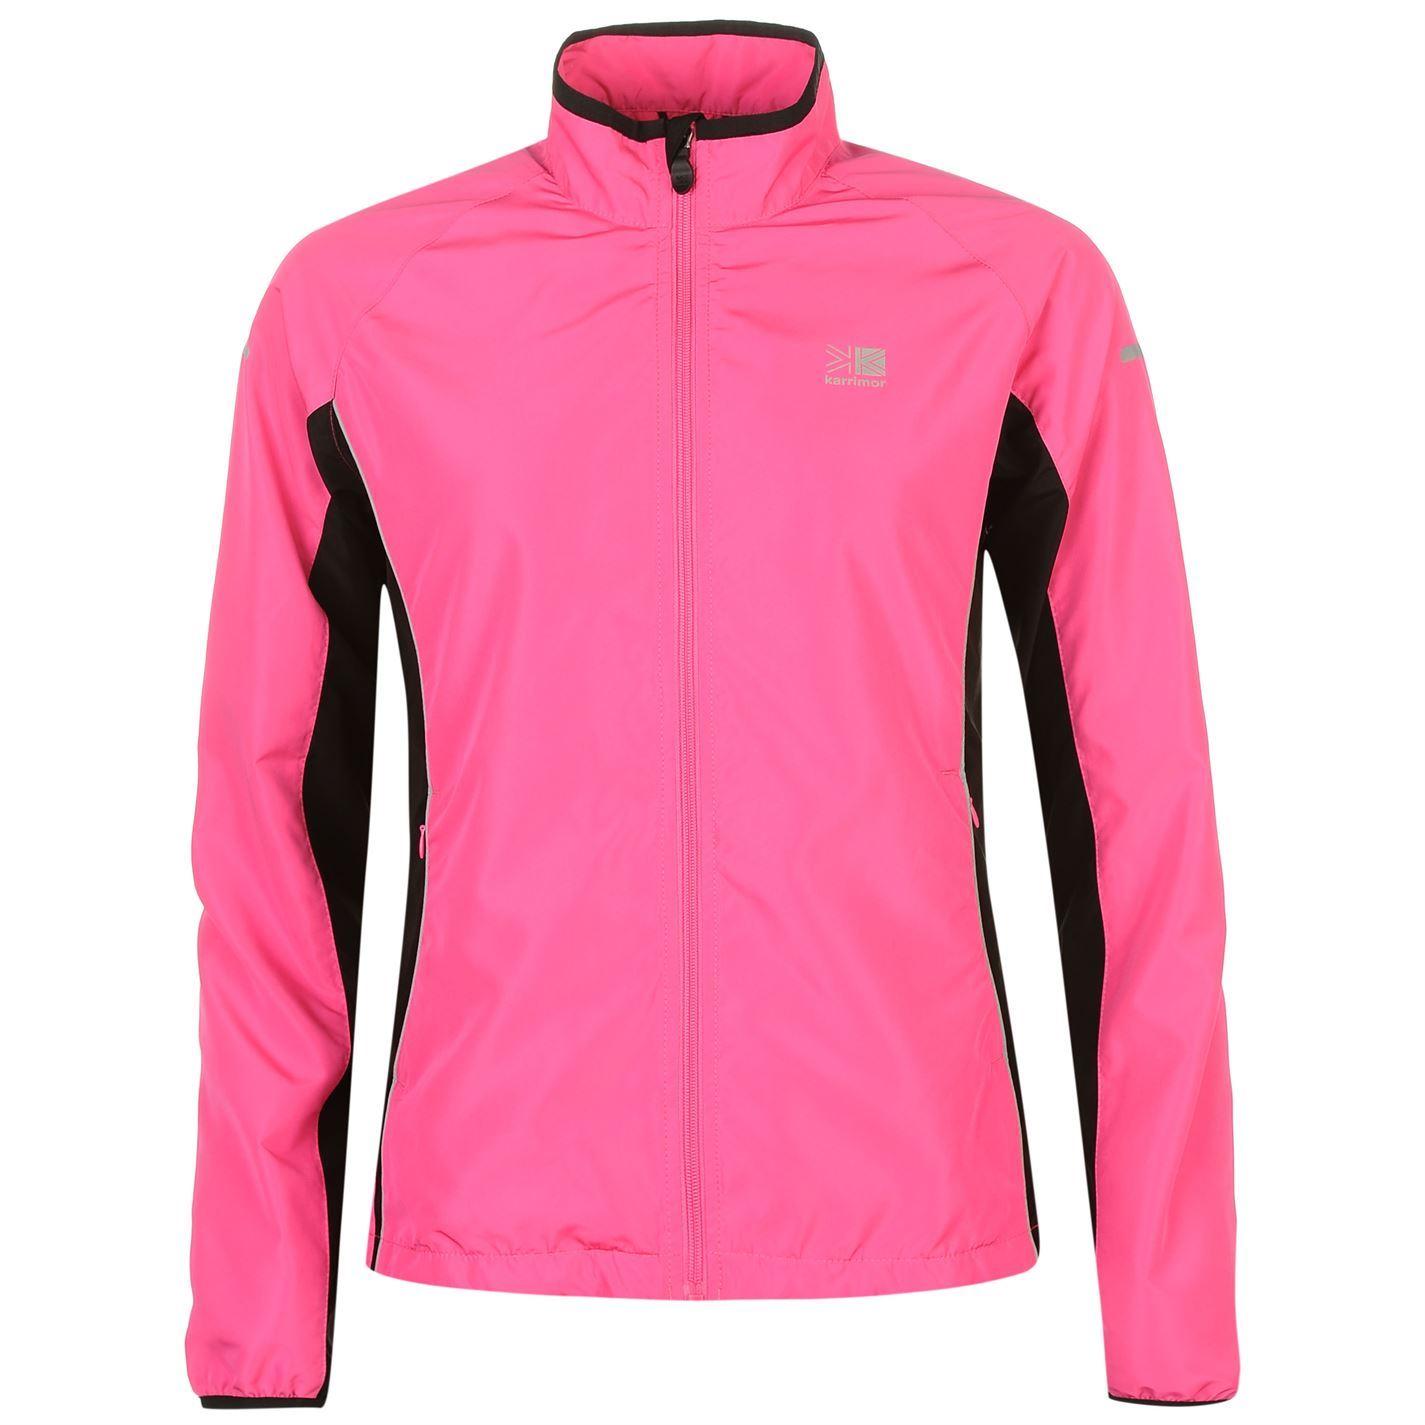 ... Karrimor Running Jacket Womens Jogging Top Fitness 3403472a9089